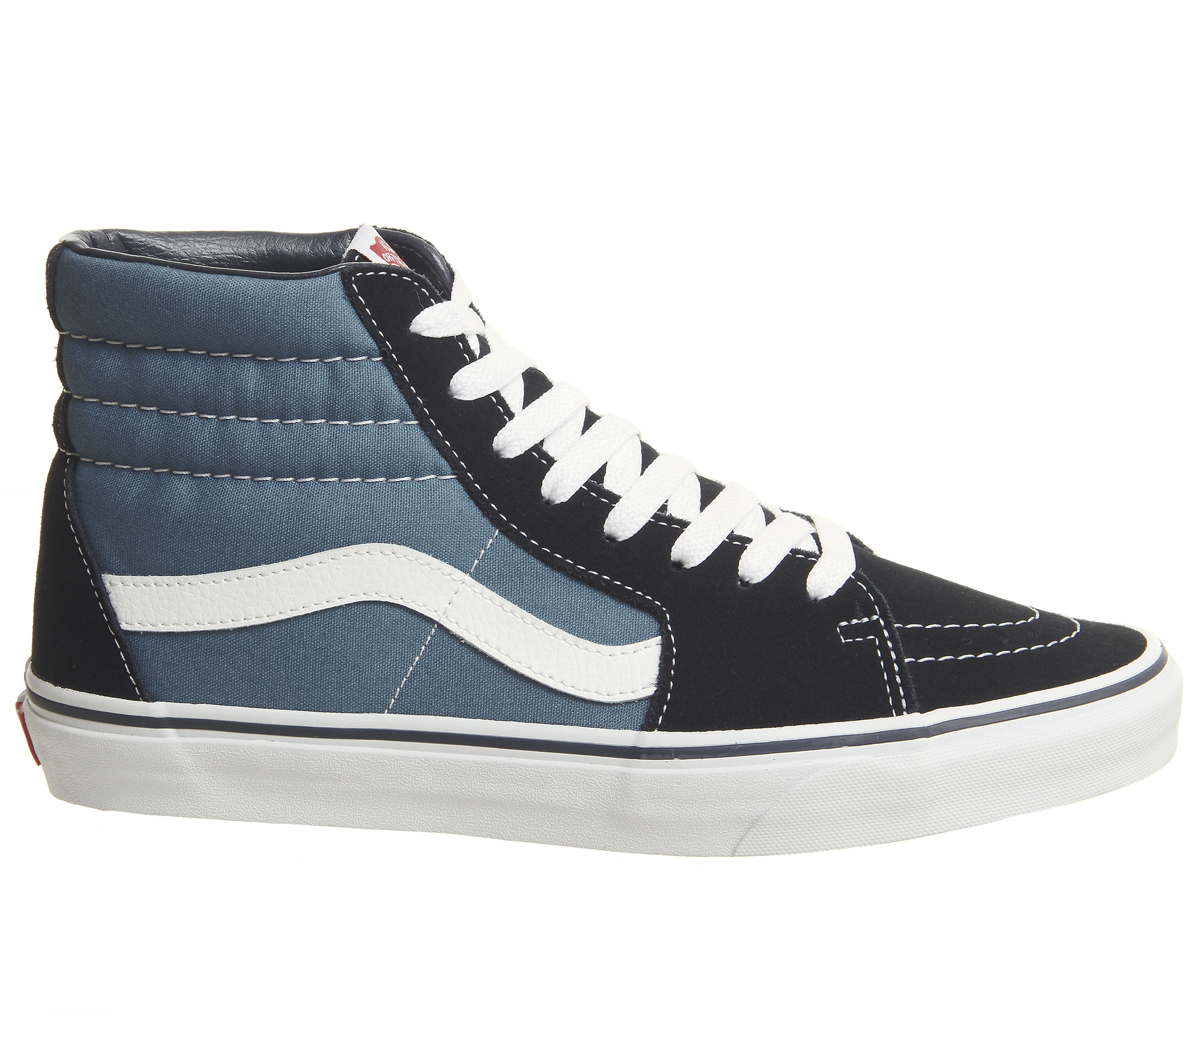 67b07c0f8d20 SENTINEL Womens Vans Sk8 Hi NAVY formatori scarpe